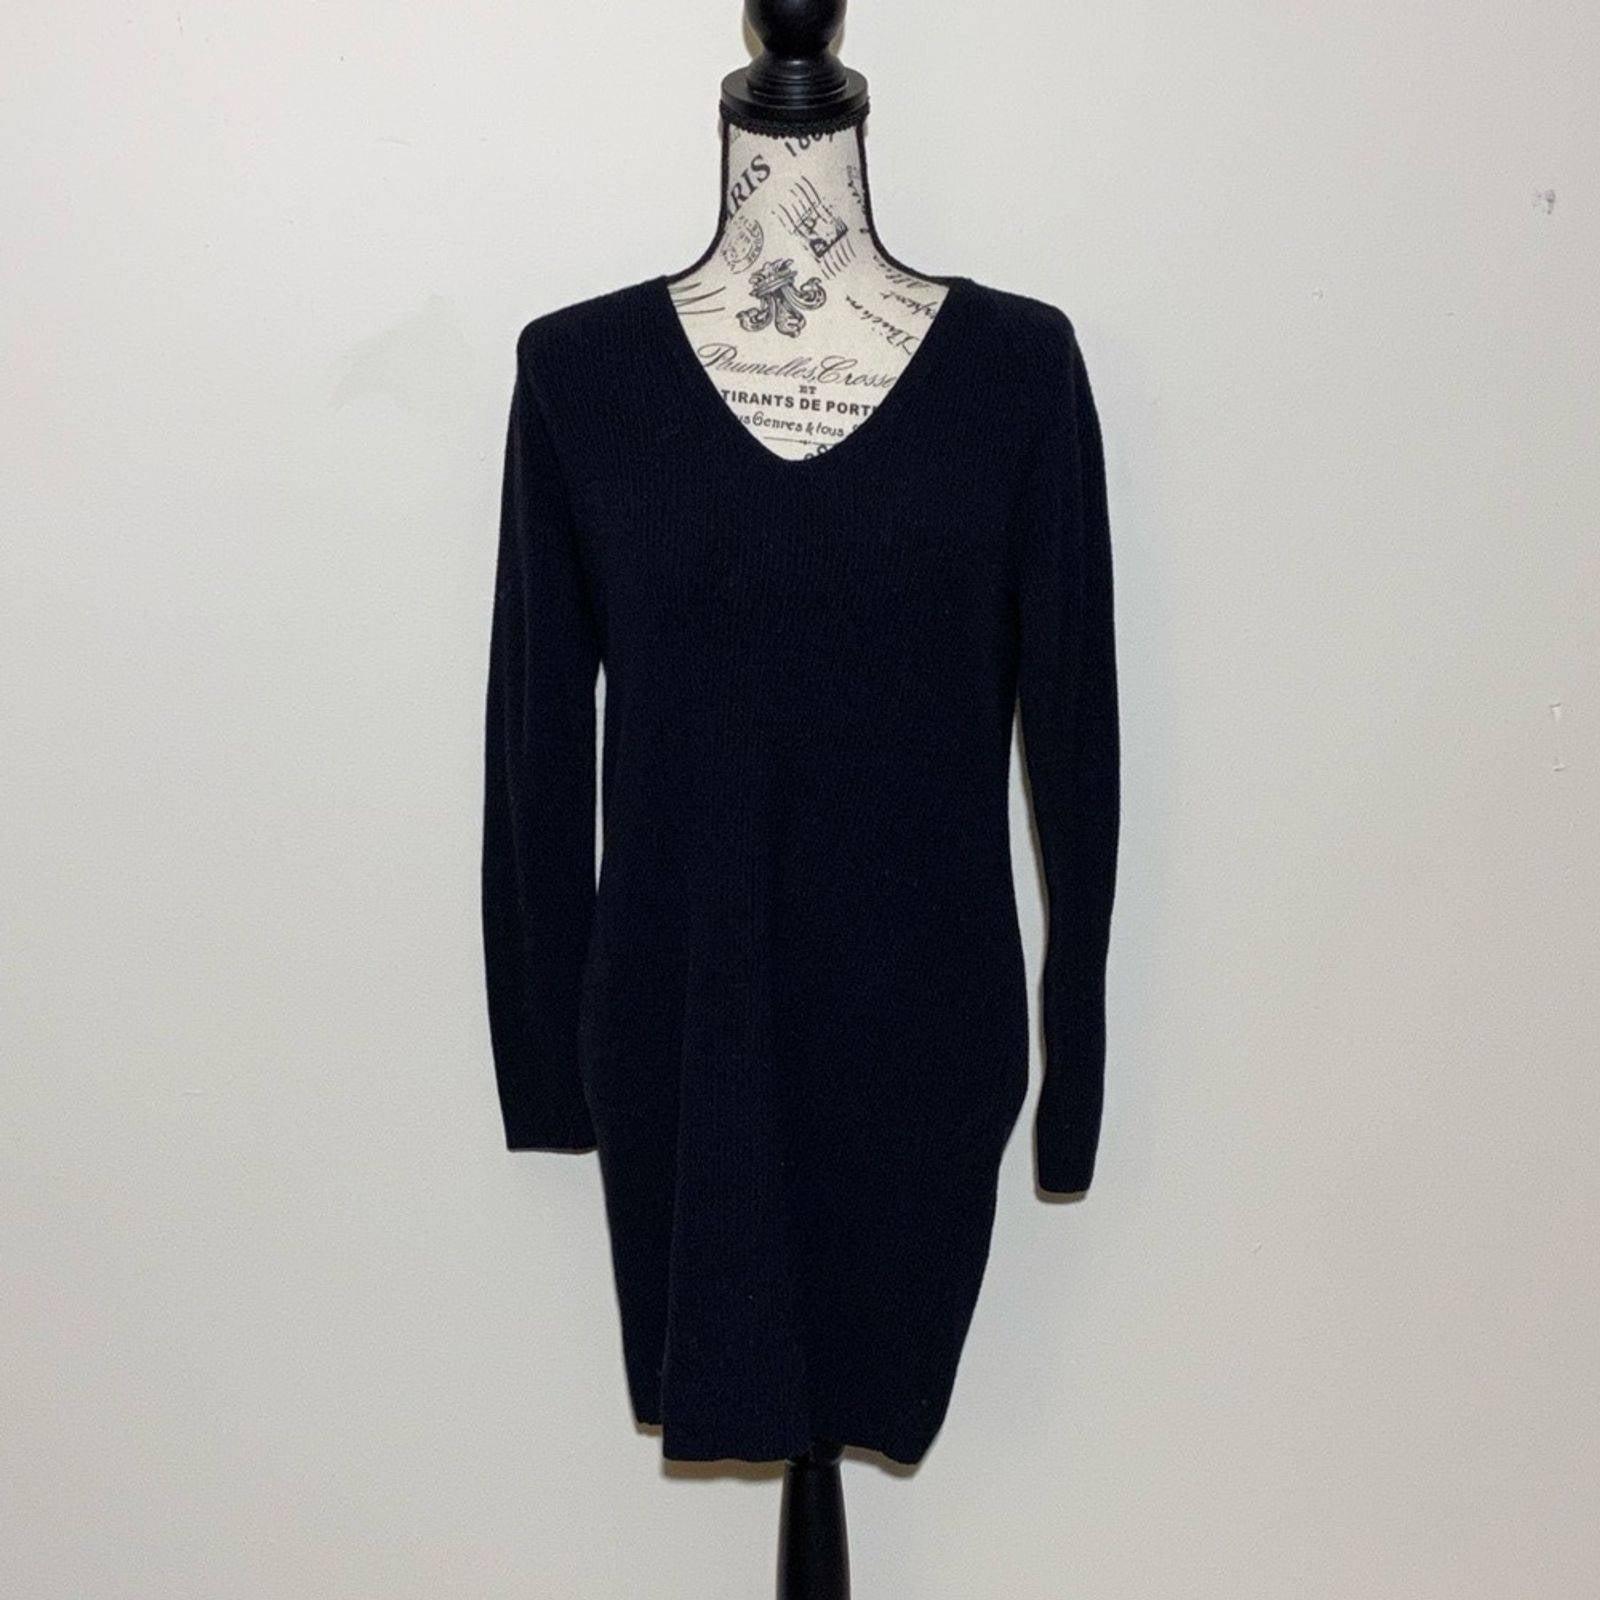 A New Day Sweater Dress Size XS